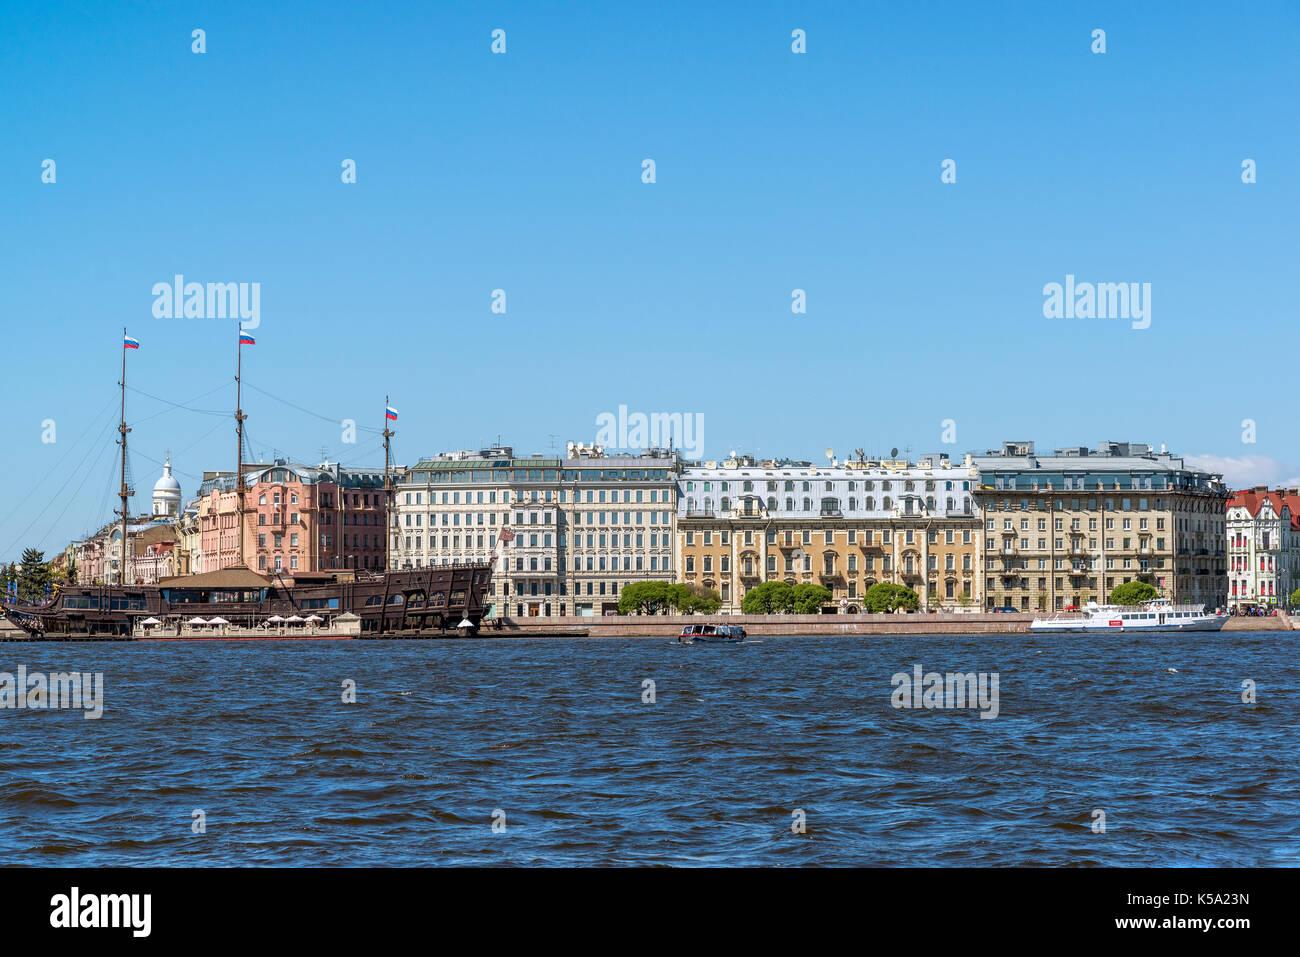 The Flying Dutchman Restaurant St Petersburg